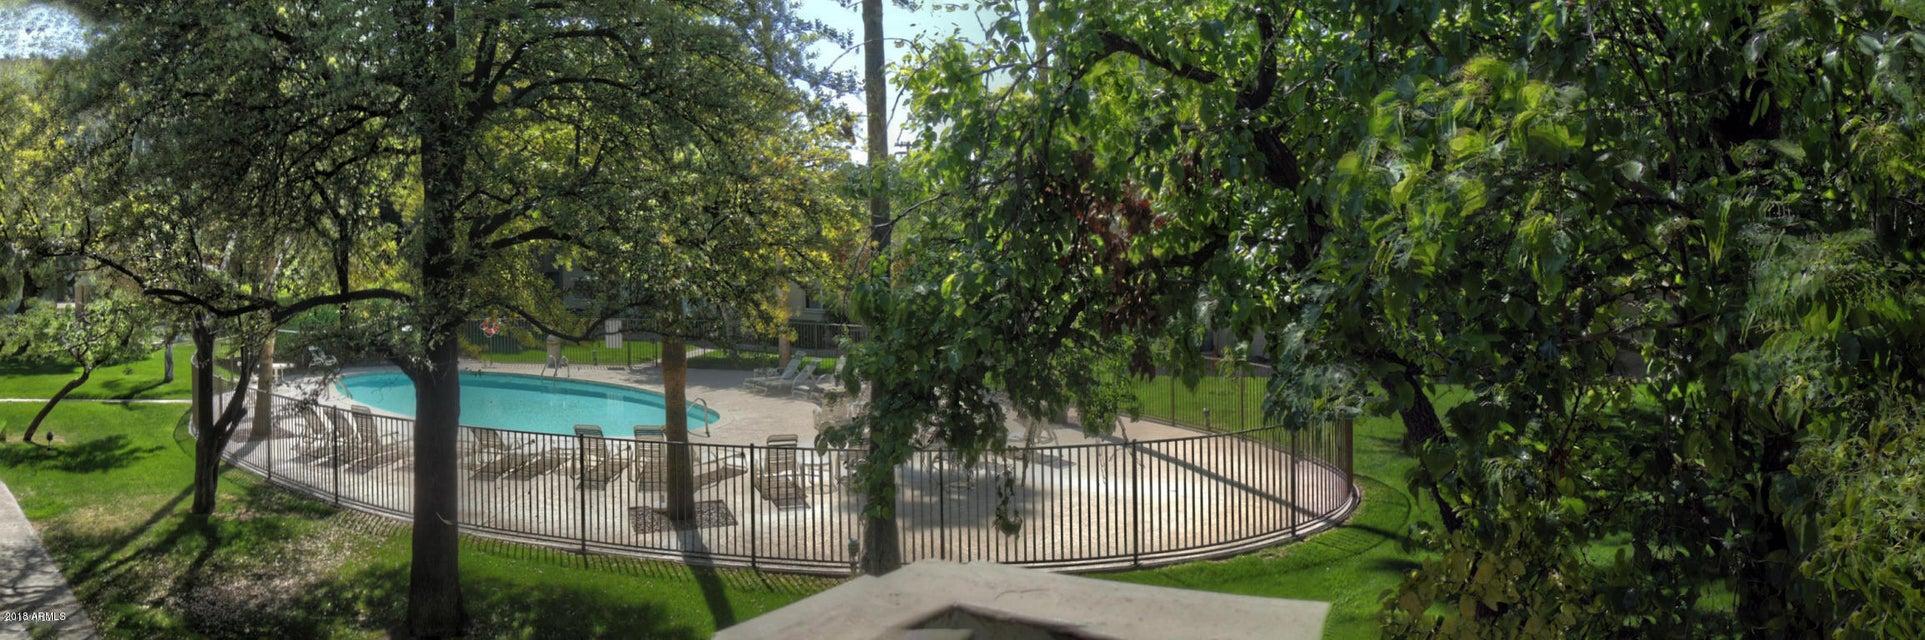 357 E THOMAS Road Unit A212 Phoenix, AZ 85012 - MLS #: 5749732